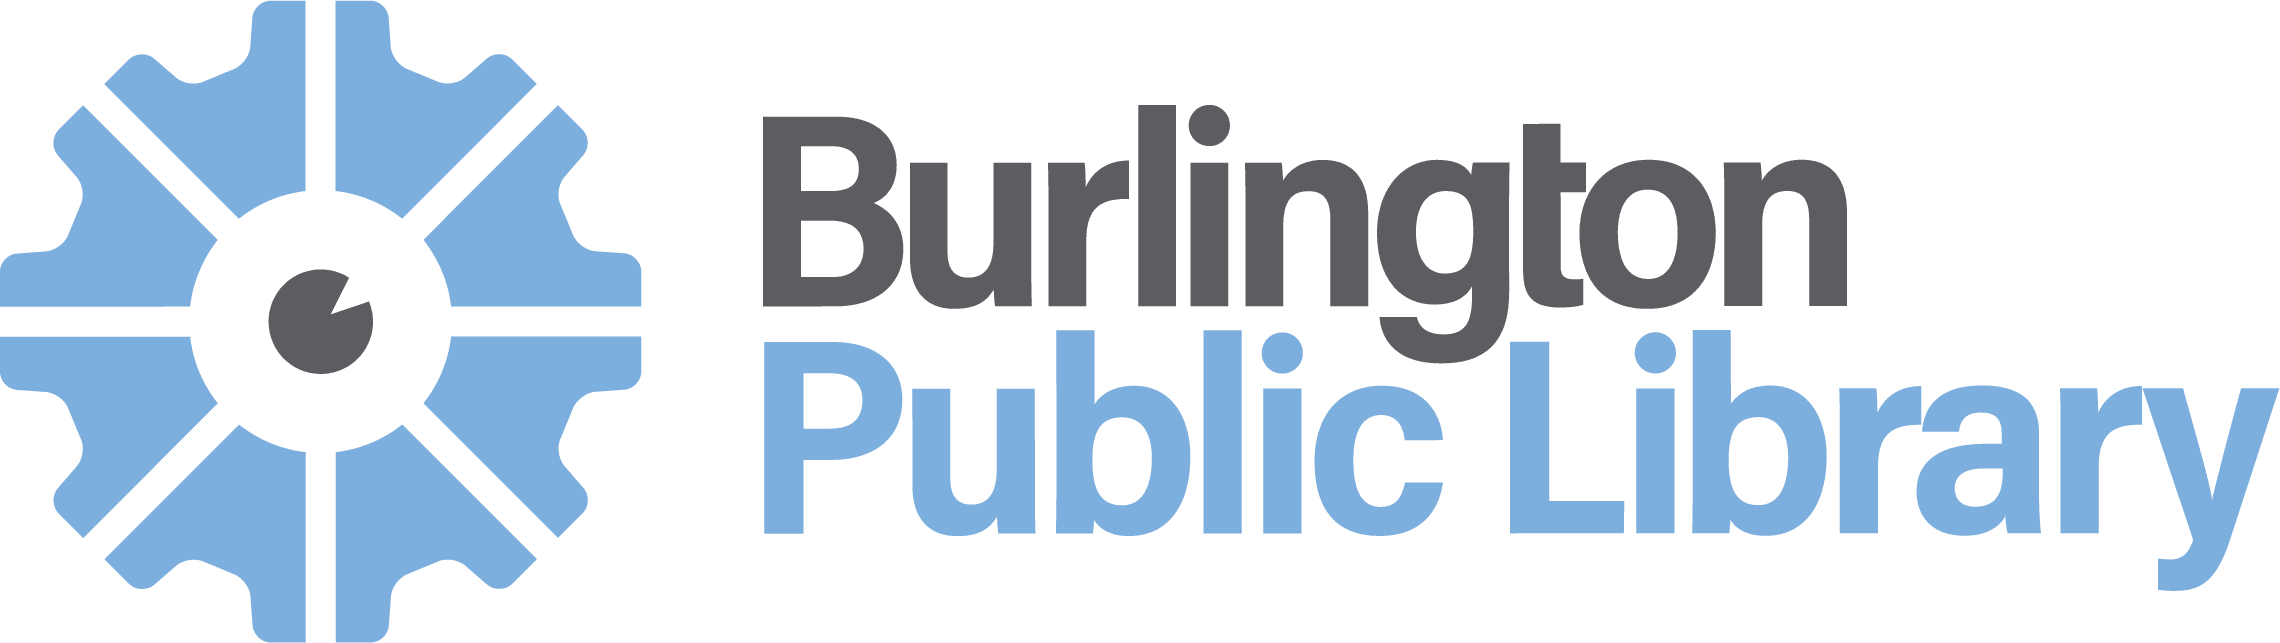 bpl-logo-full-color-rgb